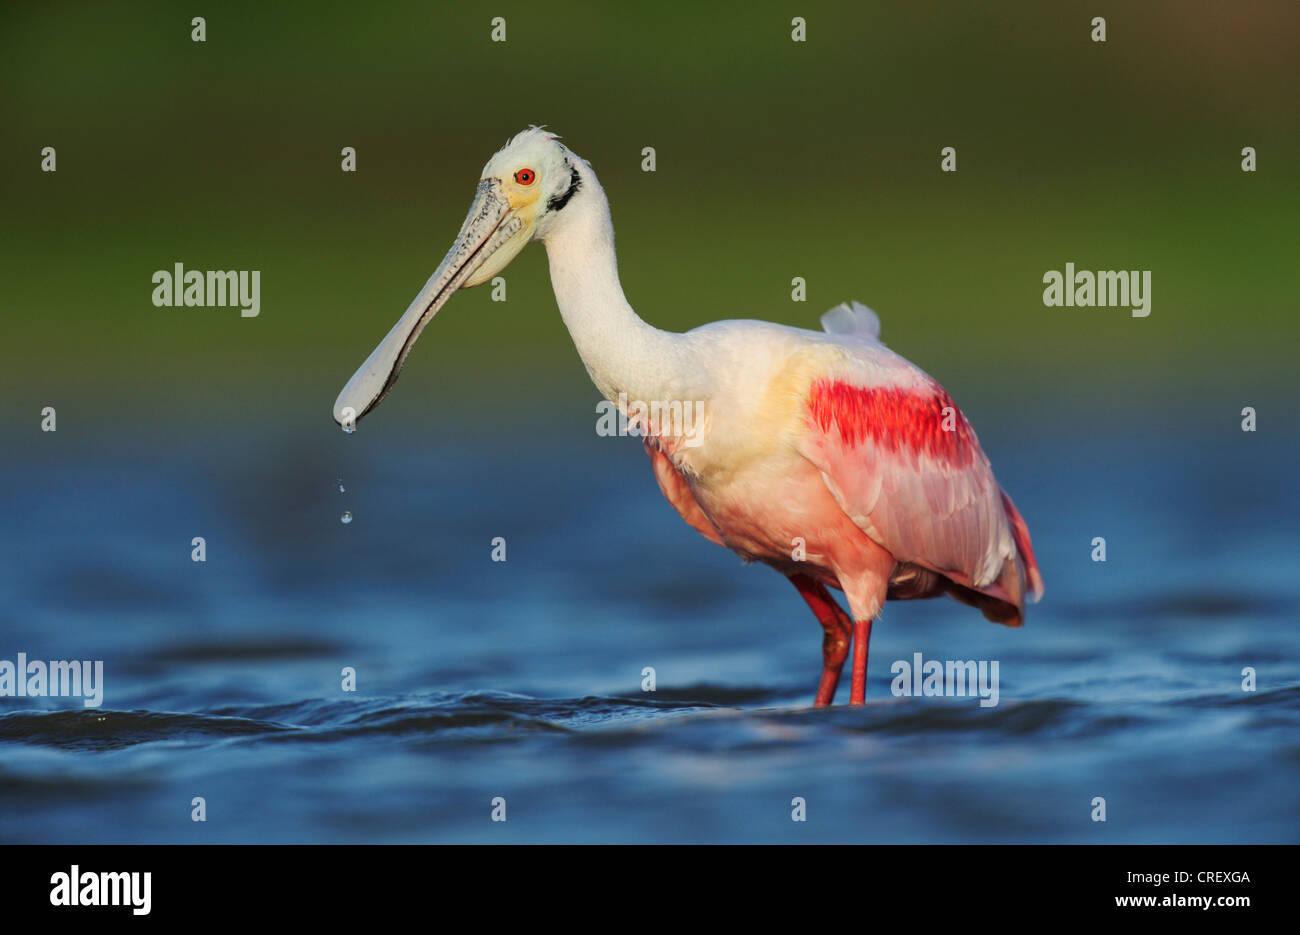 Roseate Spoonbill (Ajaia ajaja), adult feeding, Dinero, Lake Corpus Christi, South Texas, USA - Stock Image